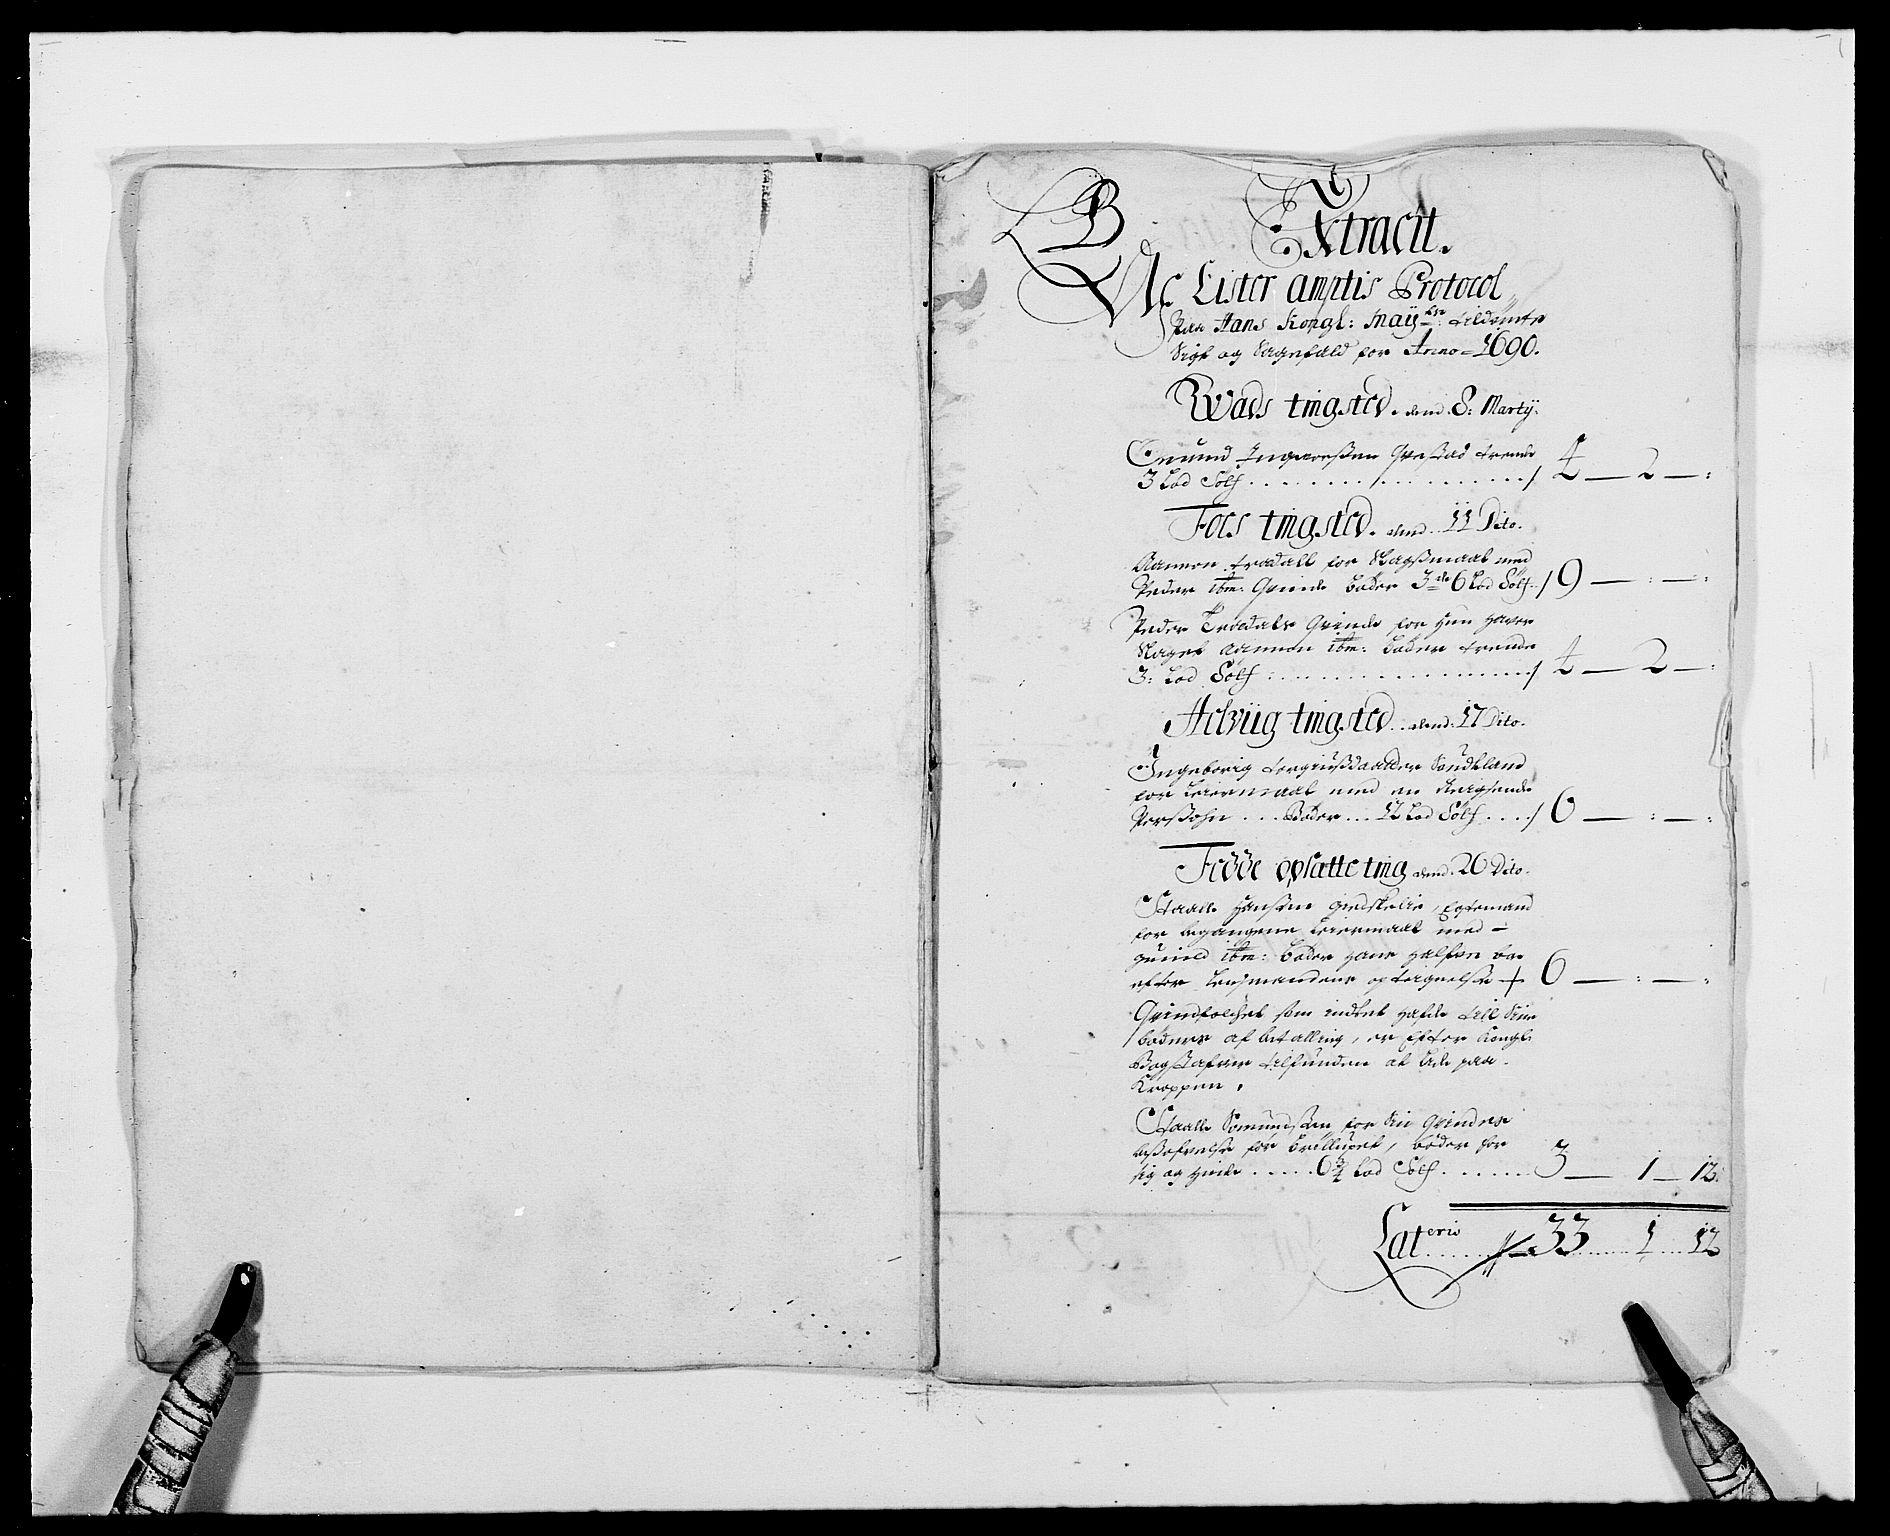 RA, Rentekammeret inntil 1814, Reviderte regnskaper, Fogderegnskap, R41/L2536: Fogderegnskap Lista, 1690-1693, s. 42